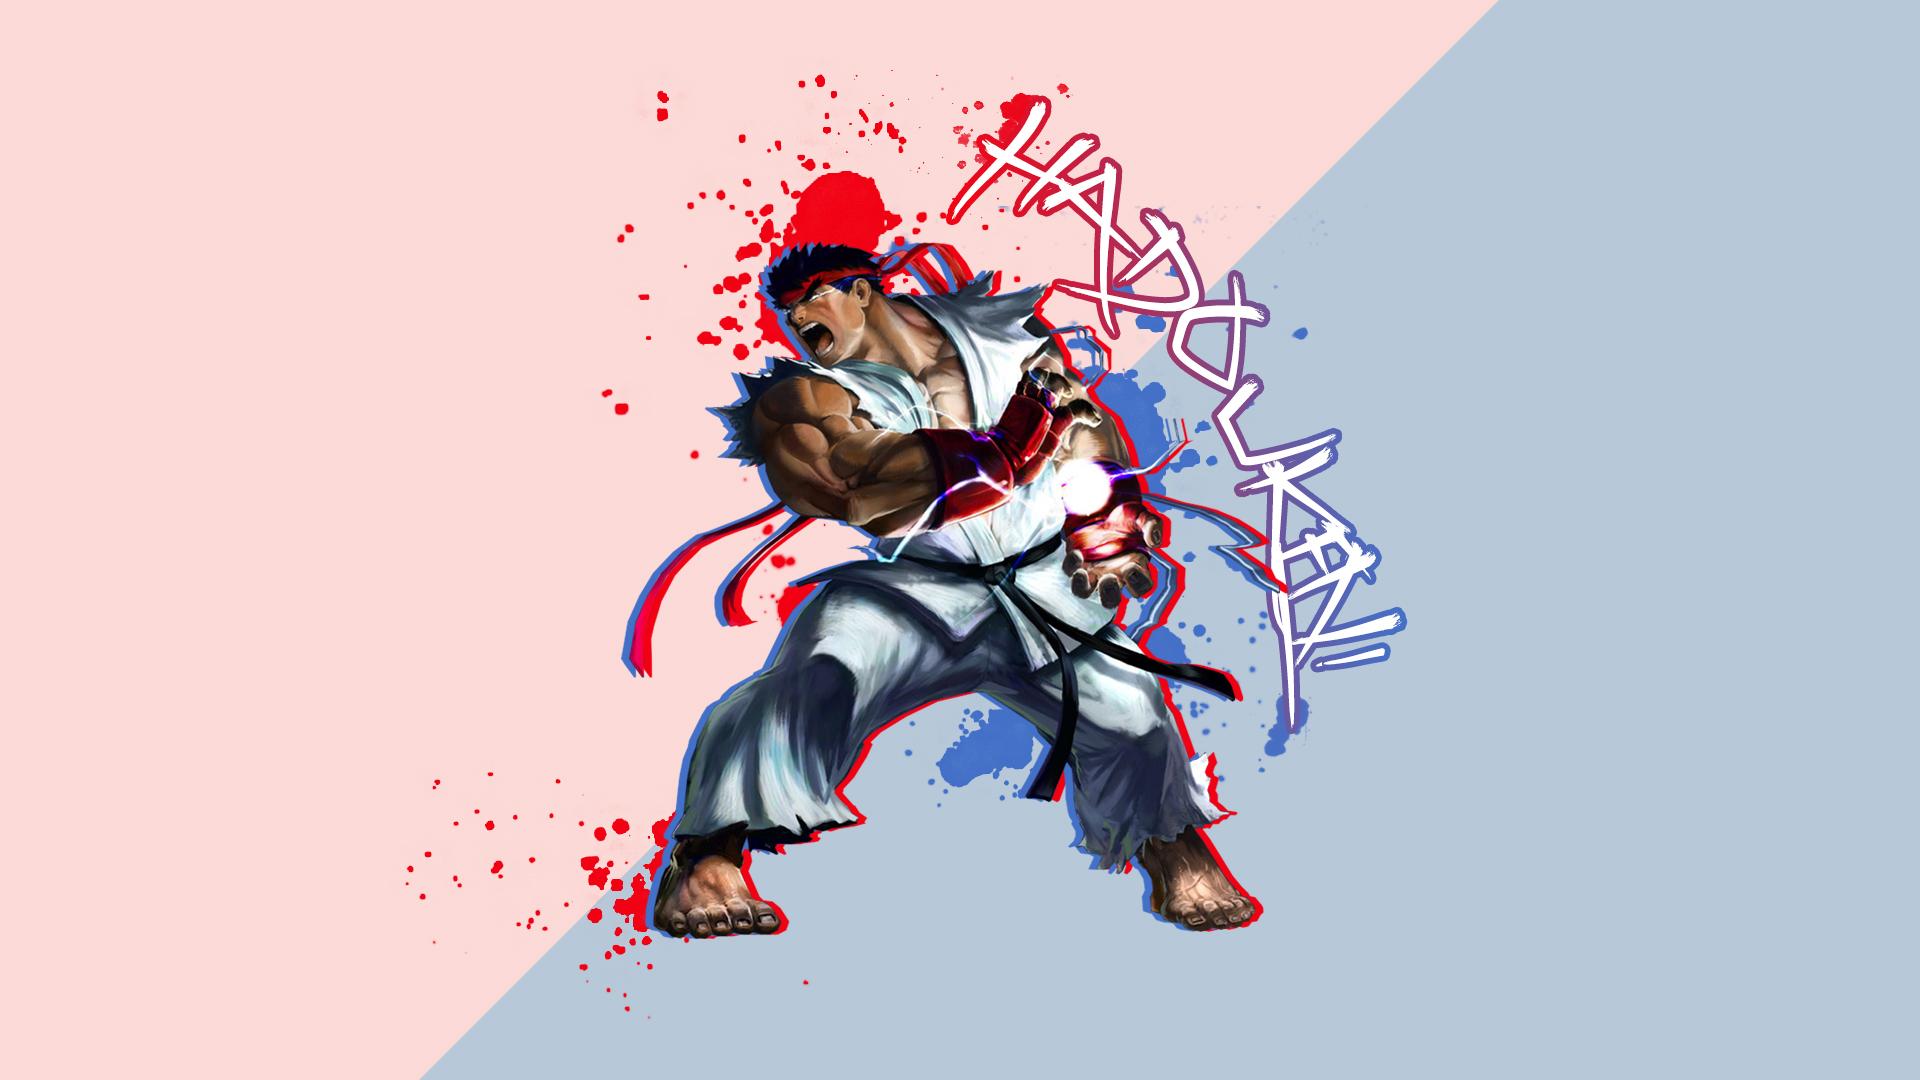 Ryu - Hadouken Wallpaper by Risurp on DeviantArt